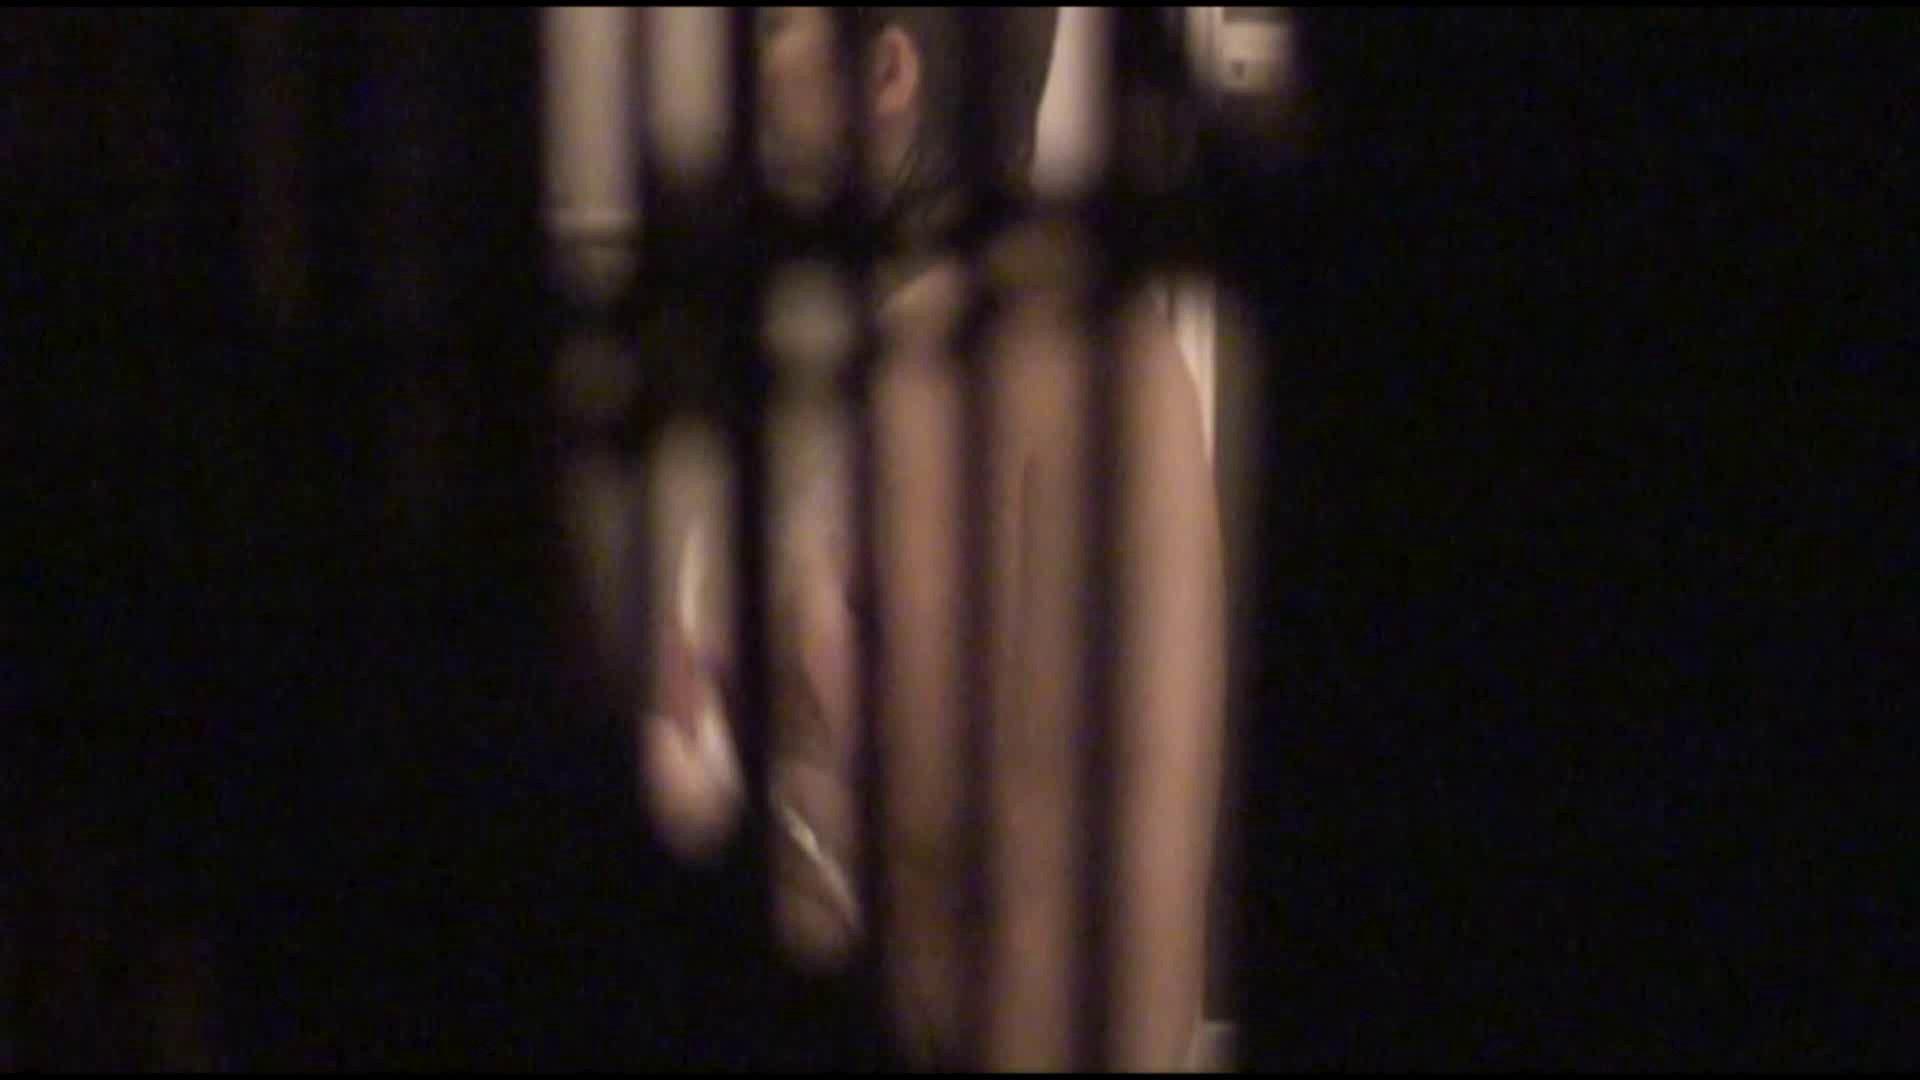 vol.05最高の極上美人!可愛い彼女の裸体をどうぞ!風呂上り鏡チェックも必見! 美人  99PIX 68